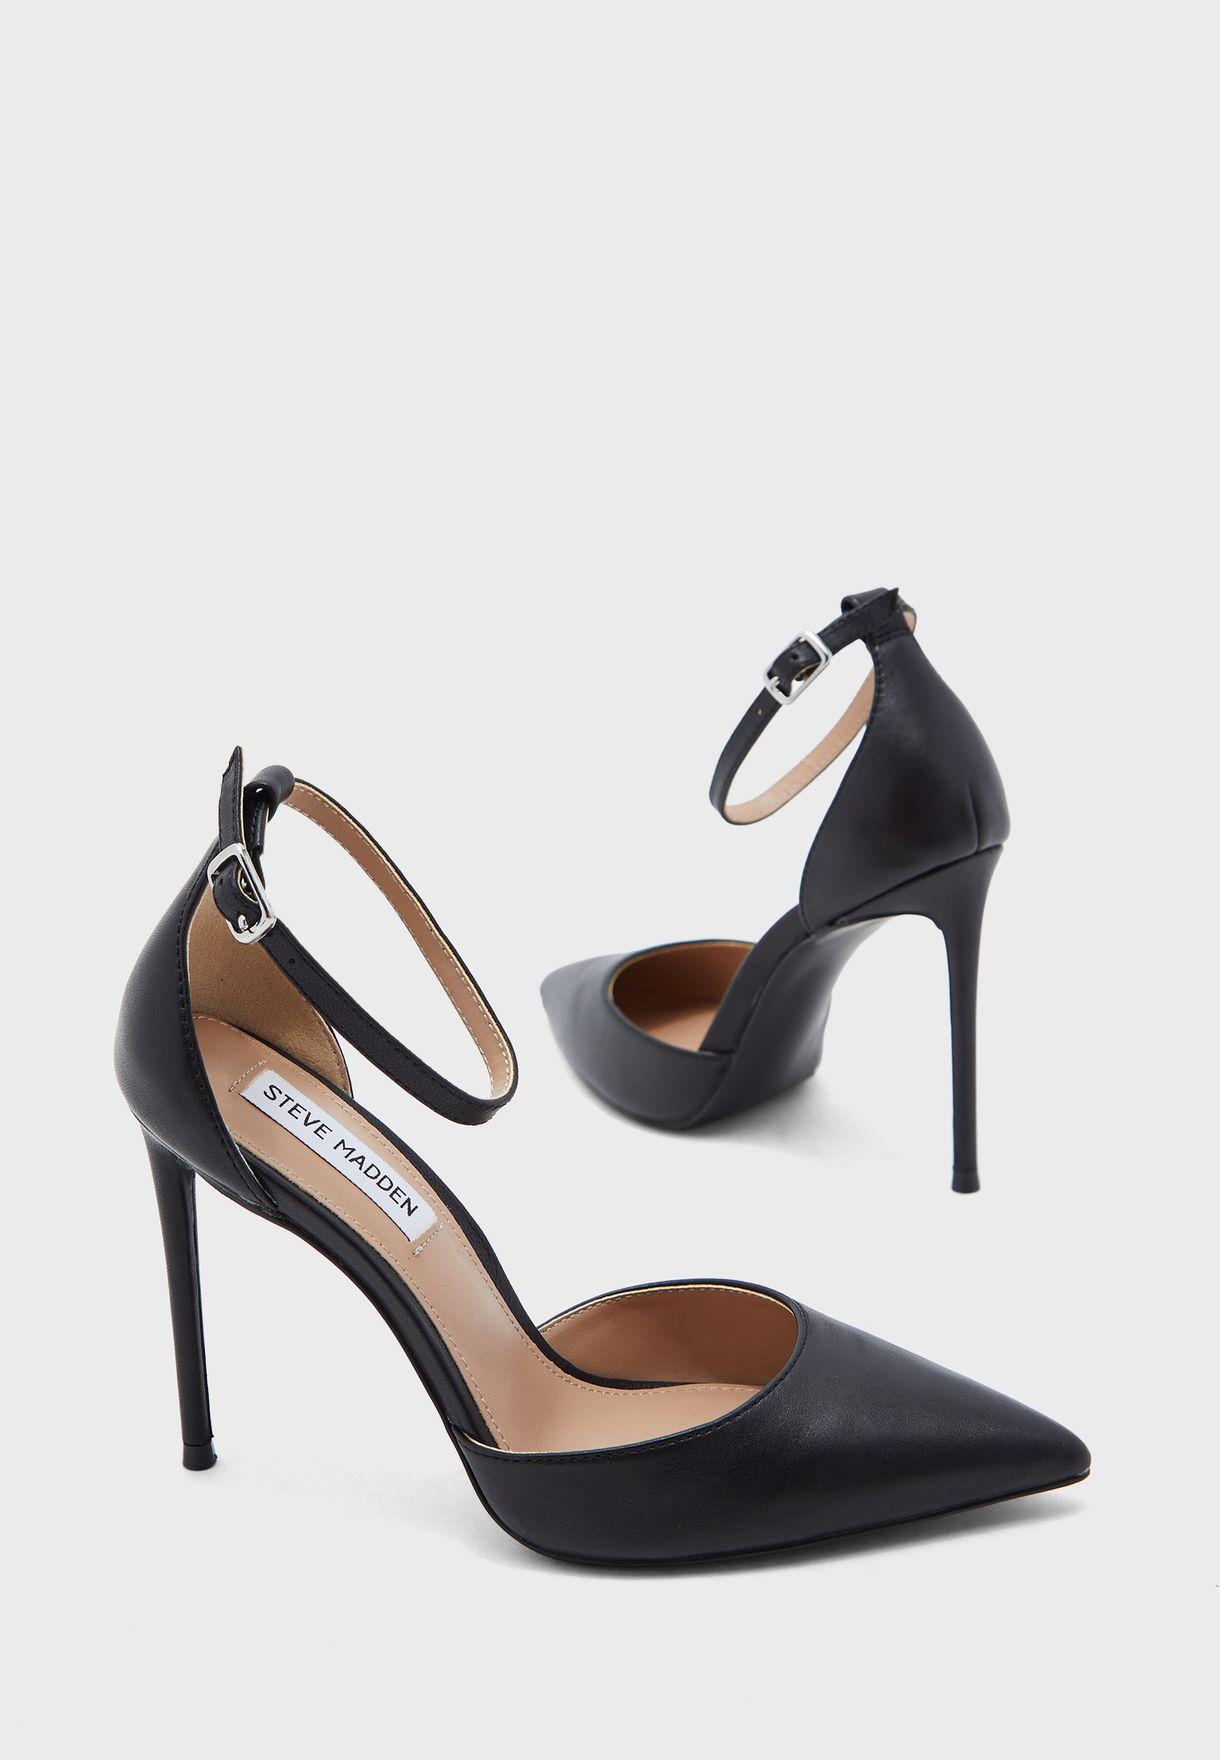 Volt Ankle Strap High Heel Pump